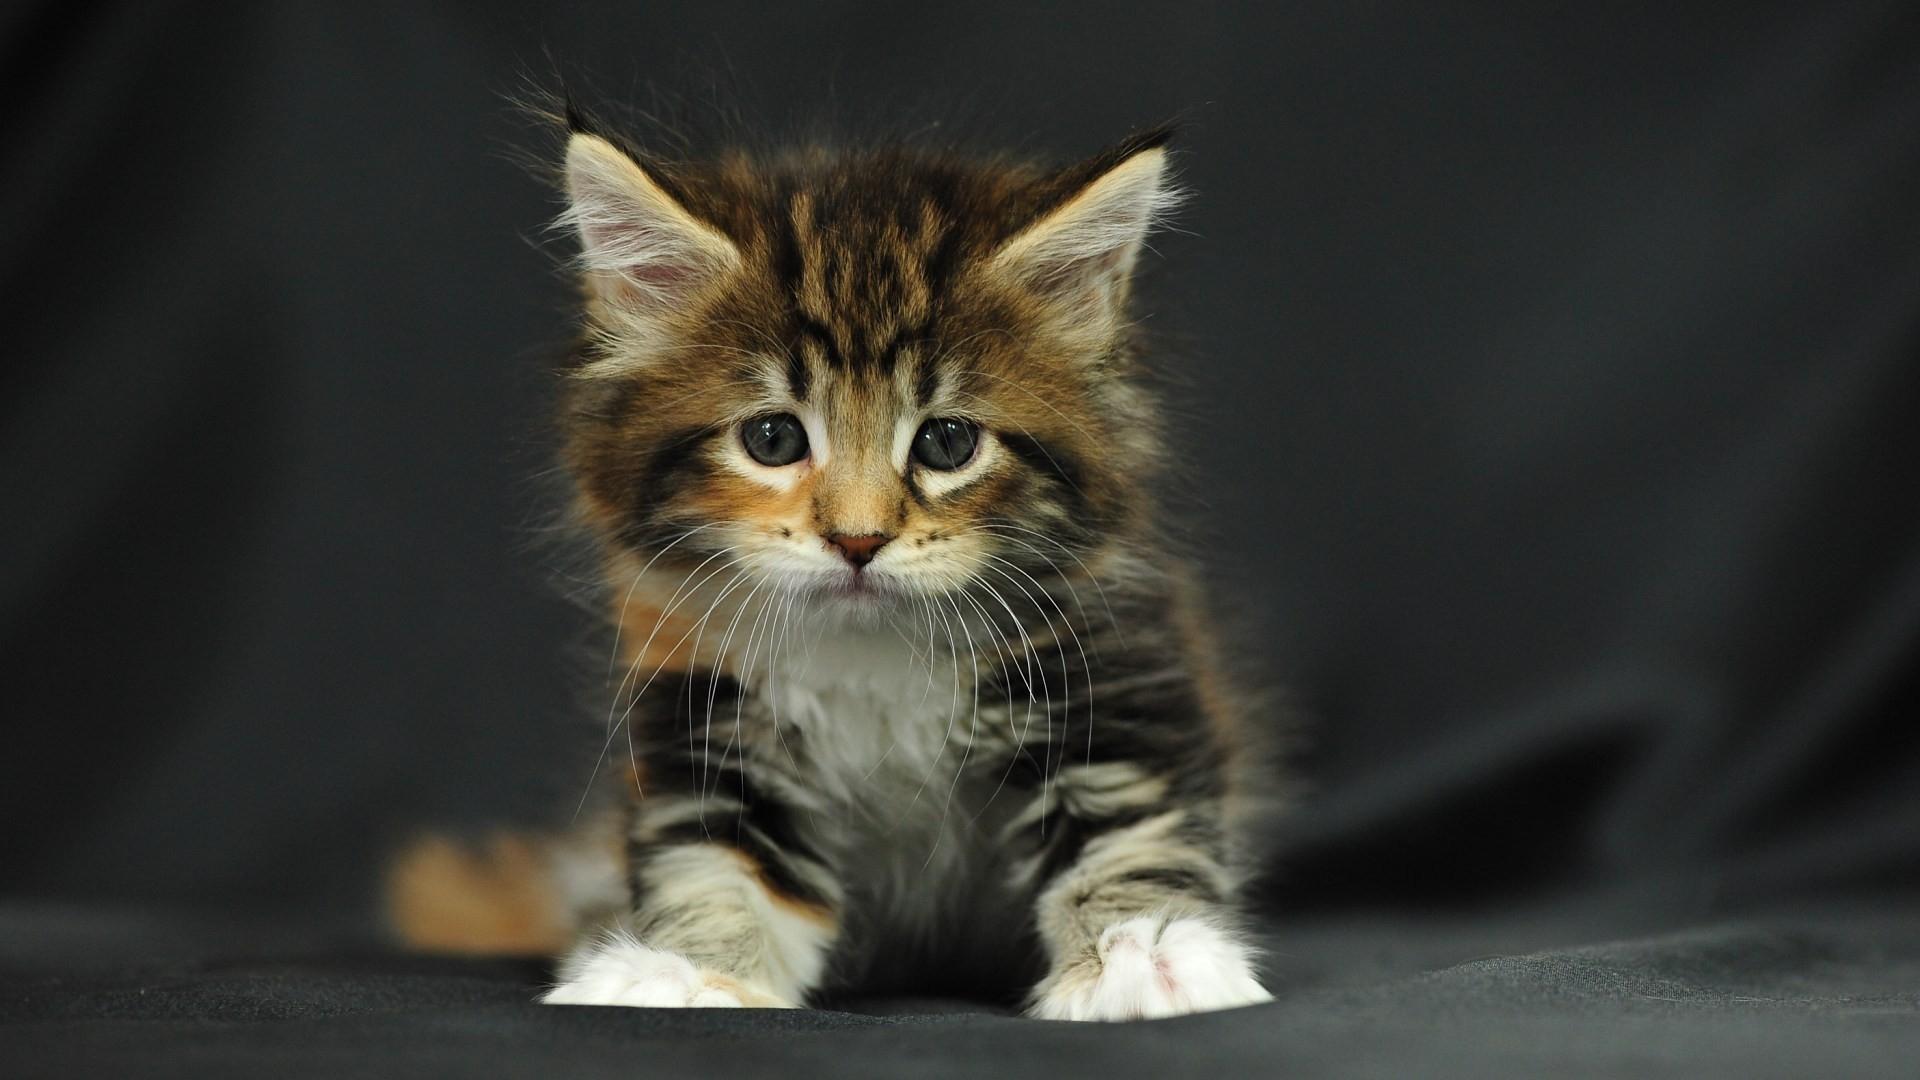 Download Wallpaper kitten baby black background